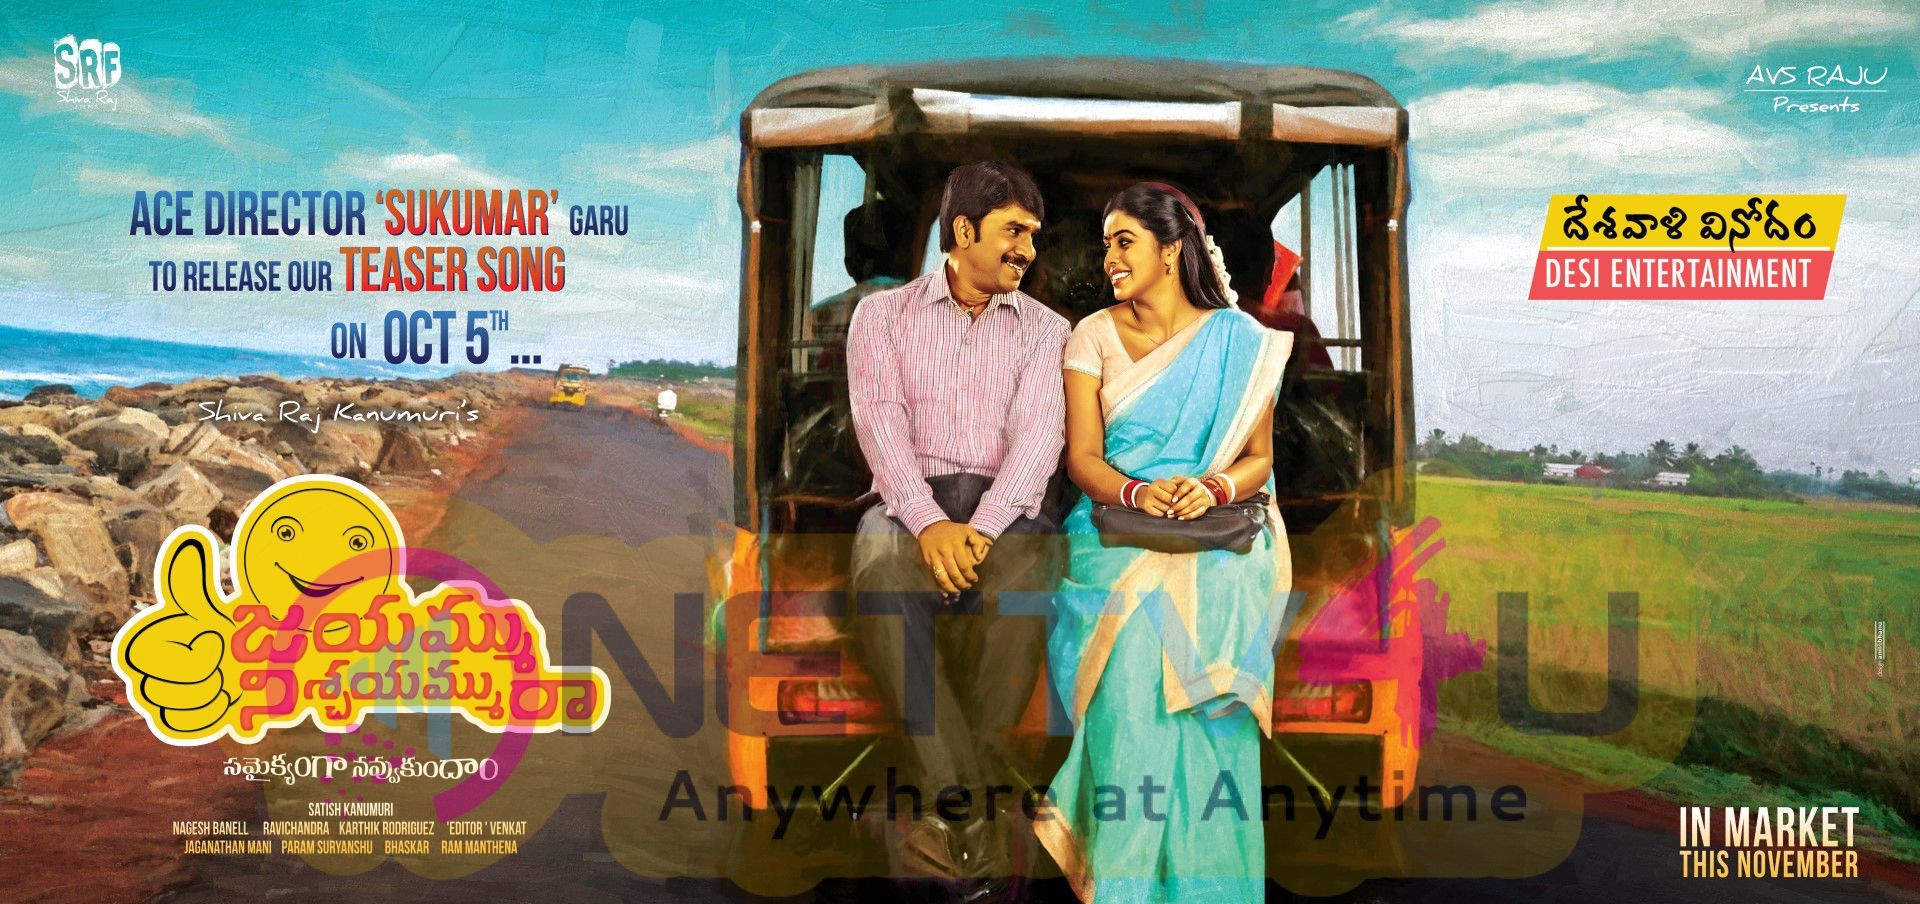 Jayammu Nischayammu Raa Movie Teaser Release Tomorrow Digital Poster